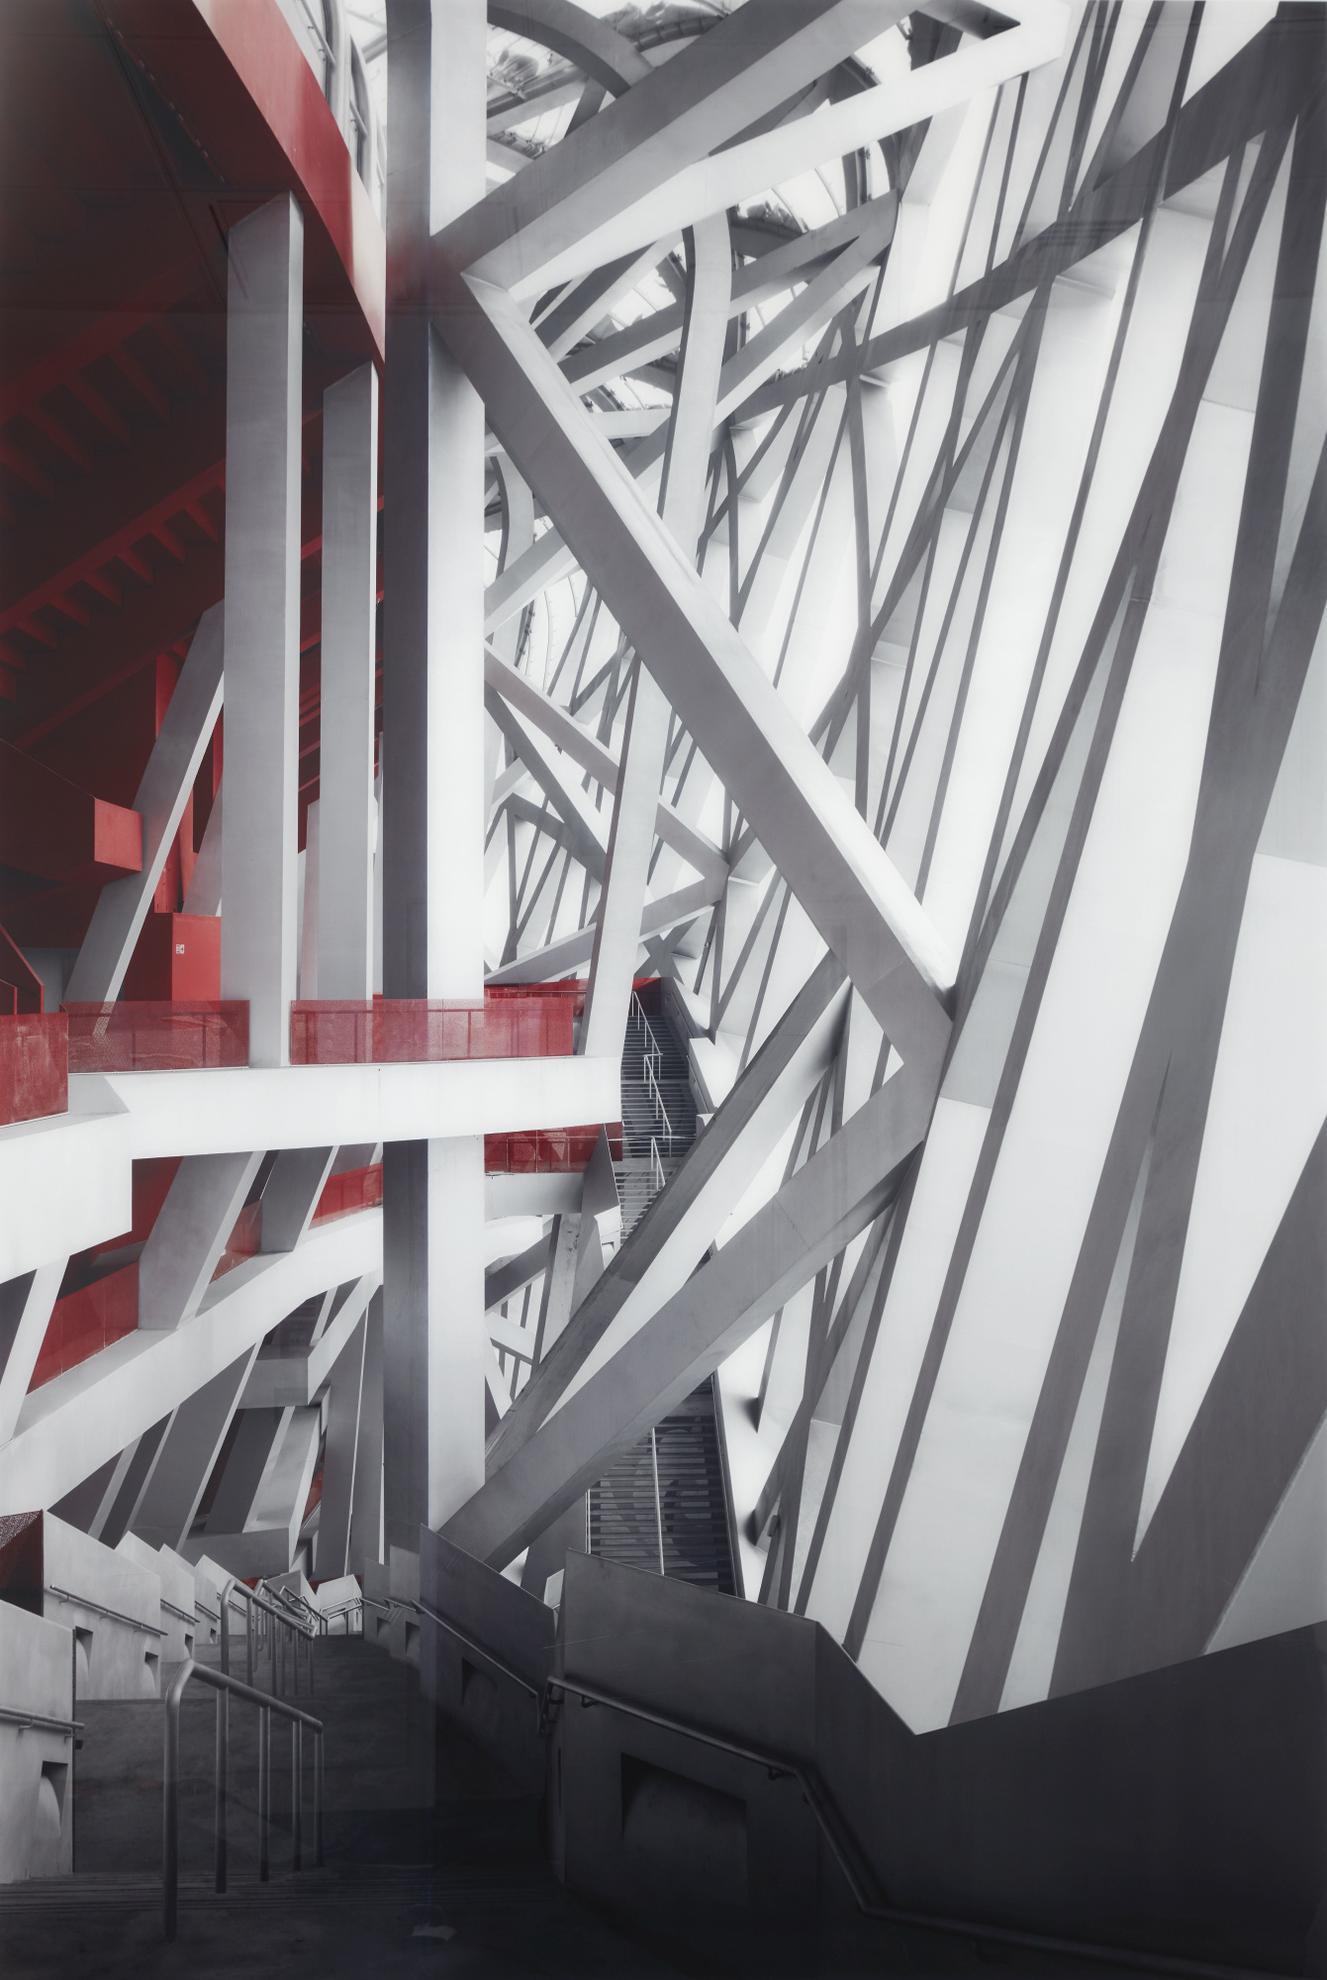 Andreas Gursky-Beijing-2010